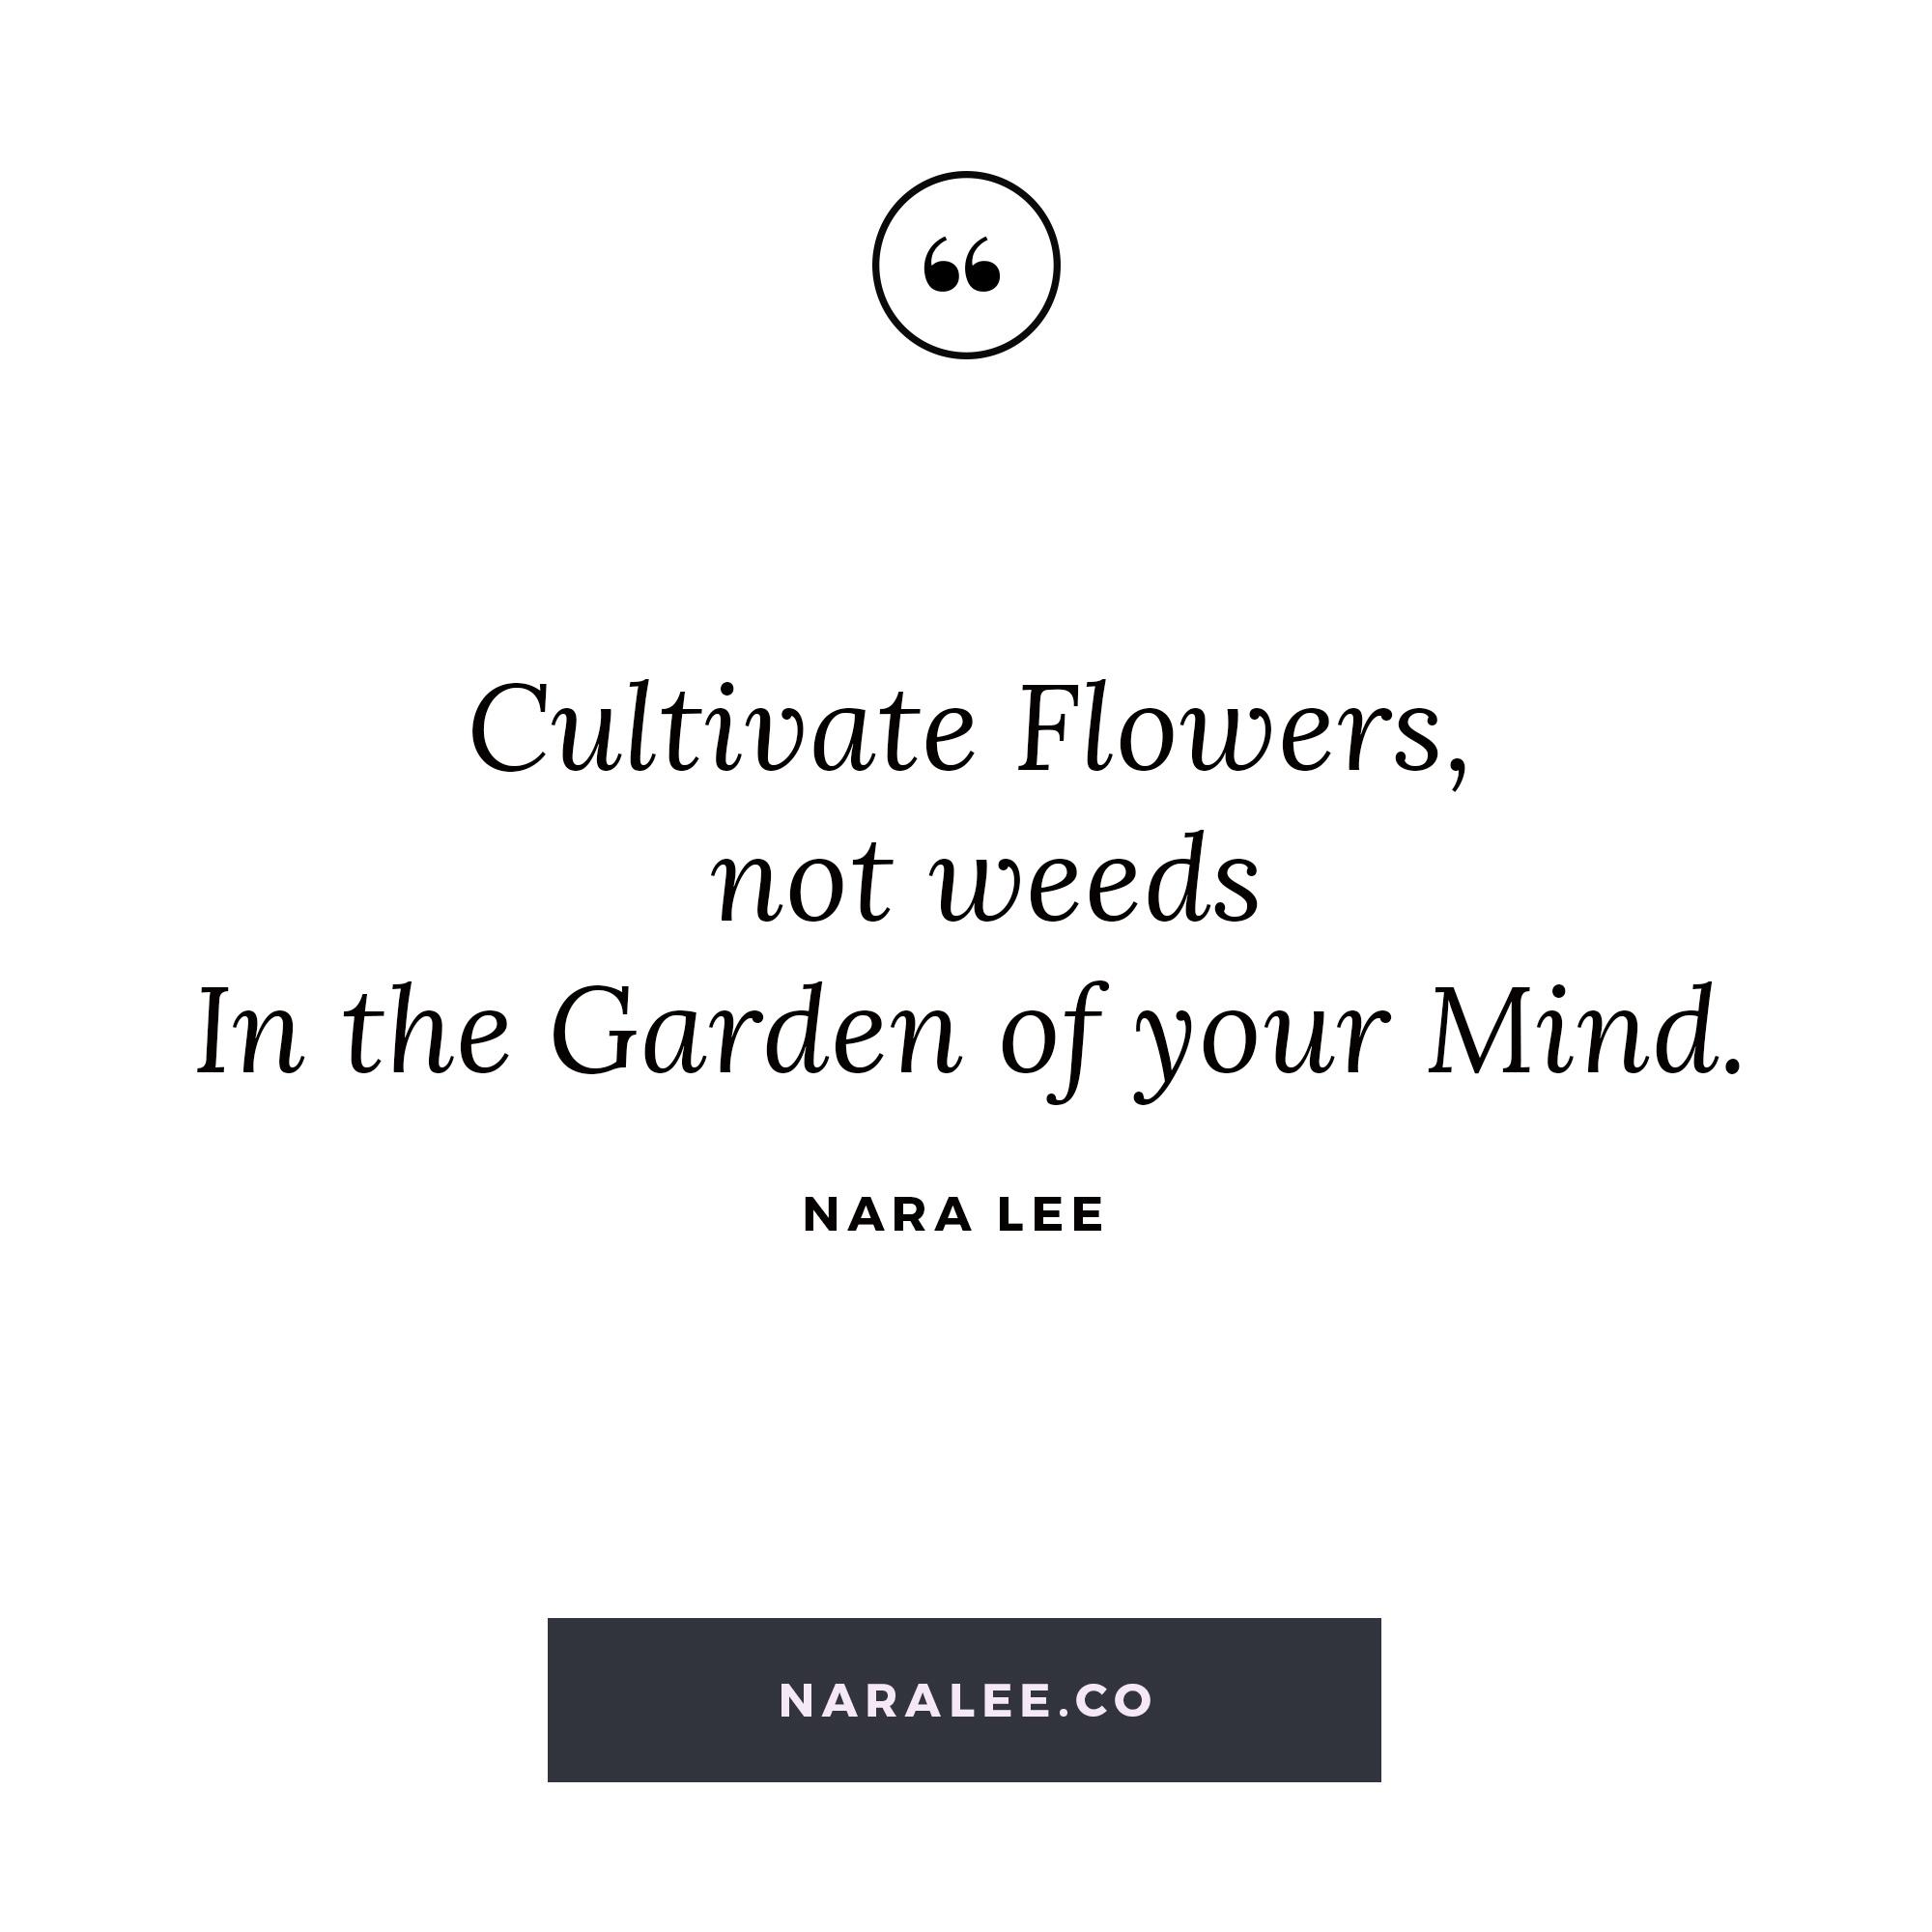 Culivate Flowers.jpg